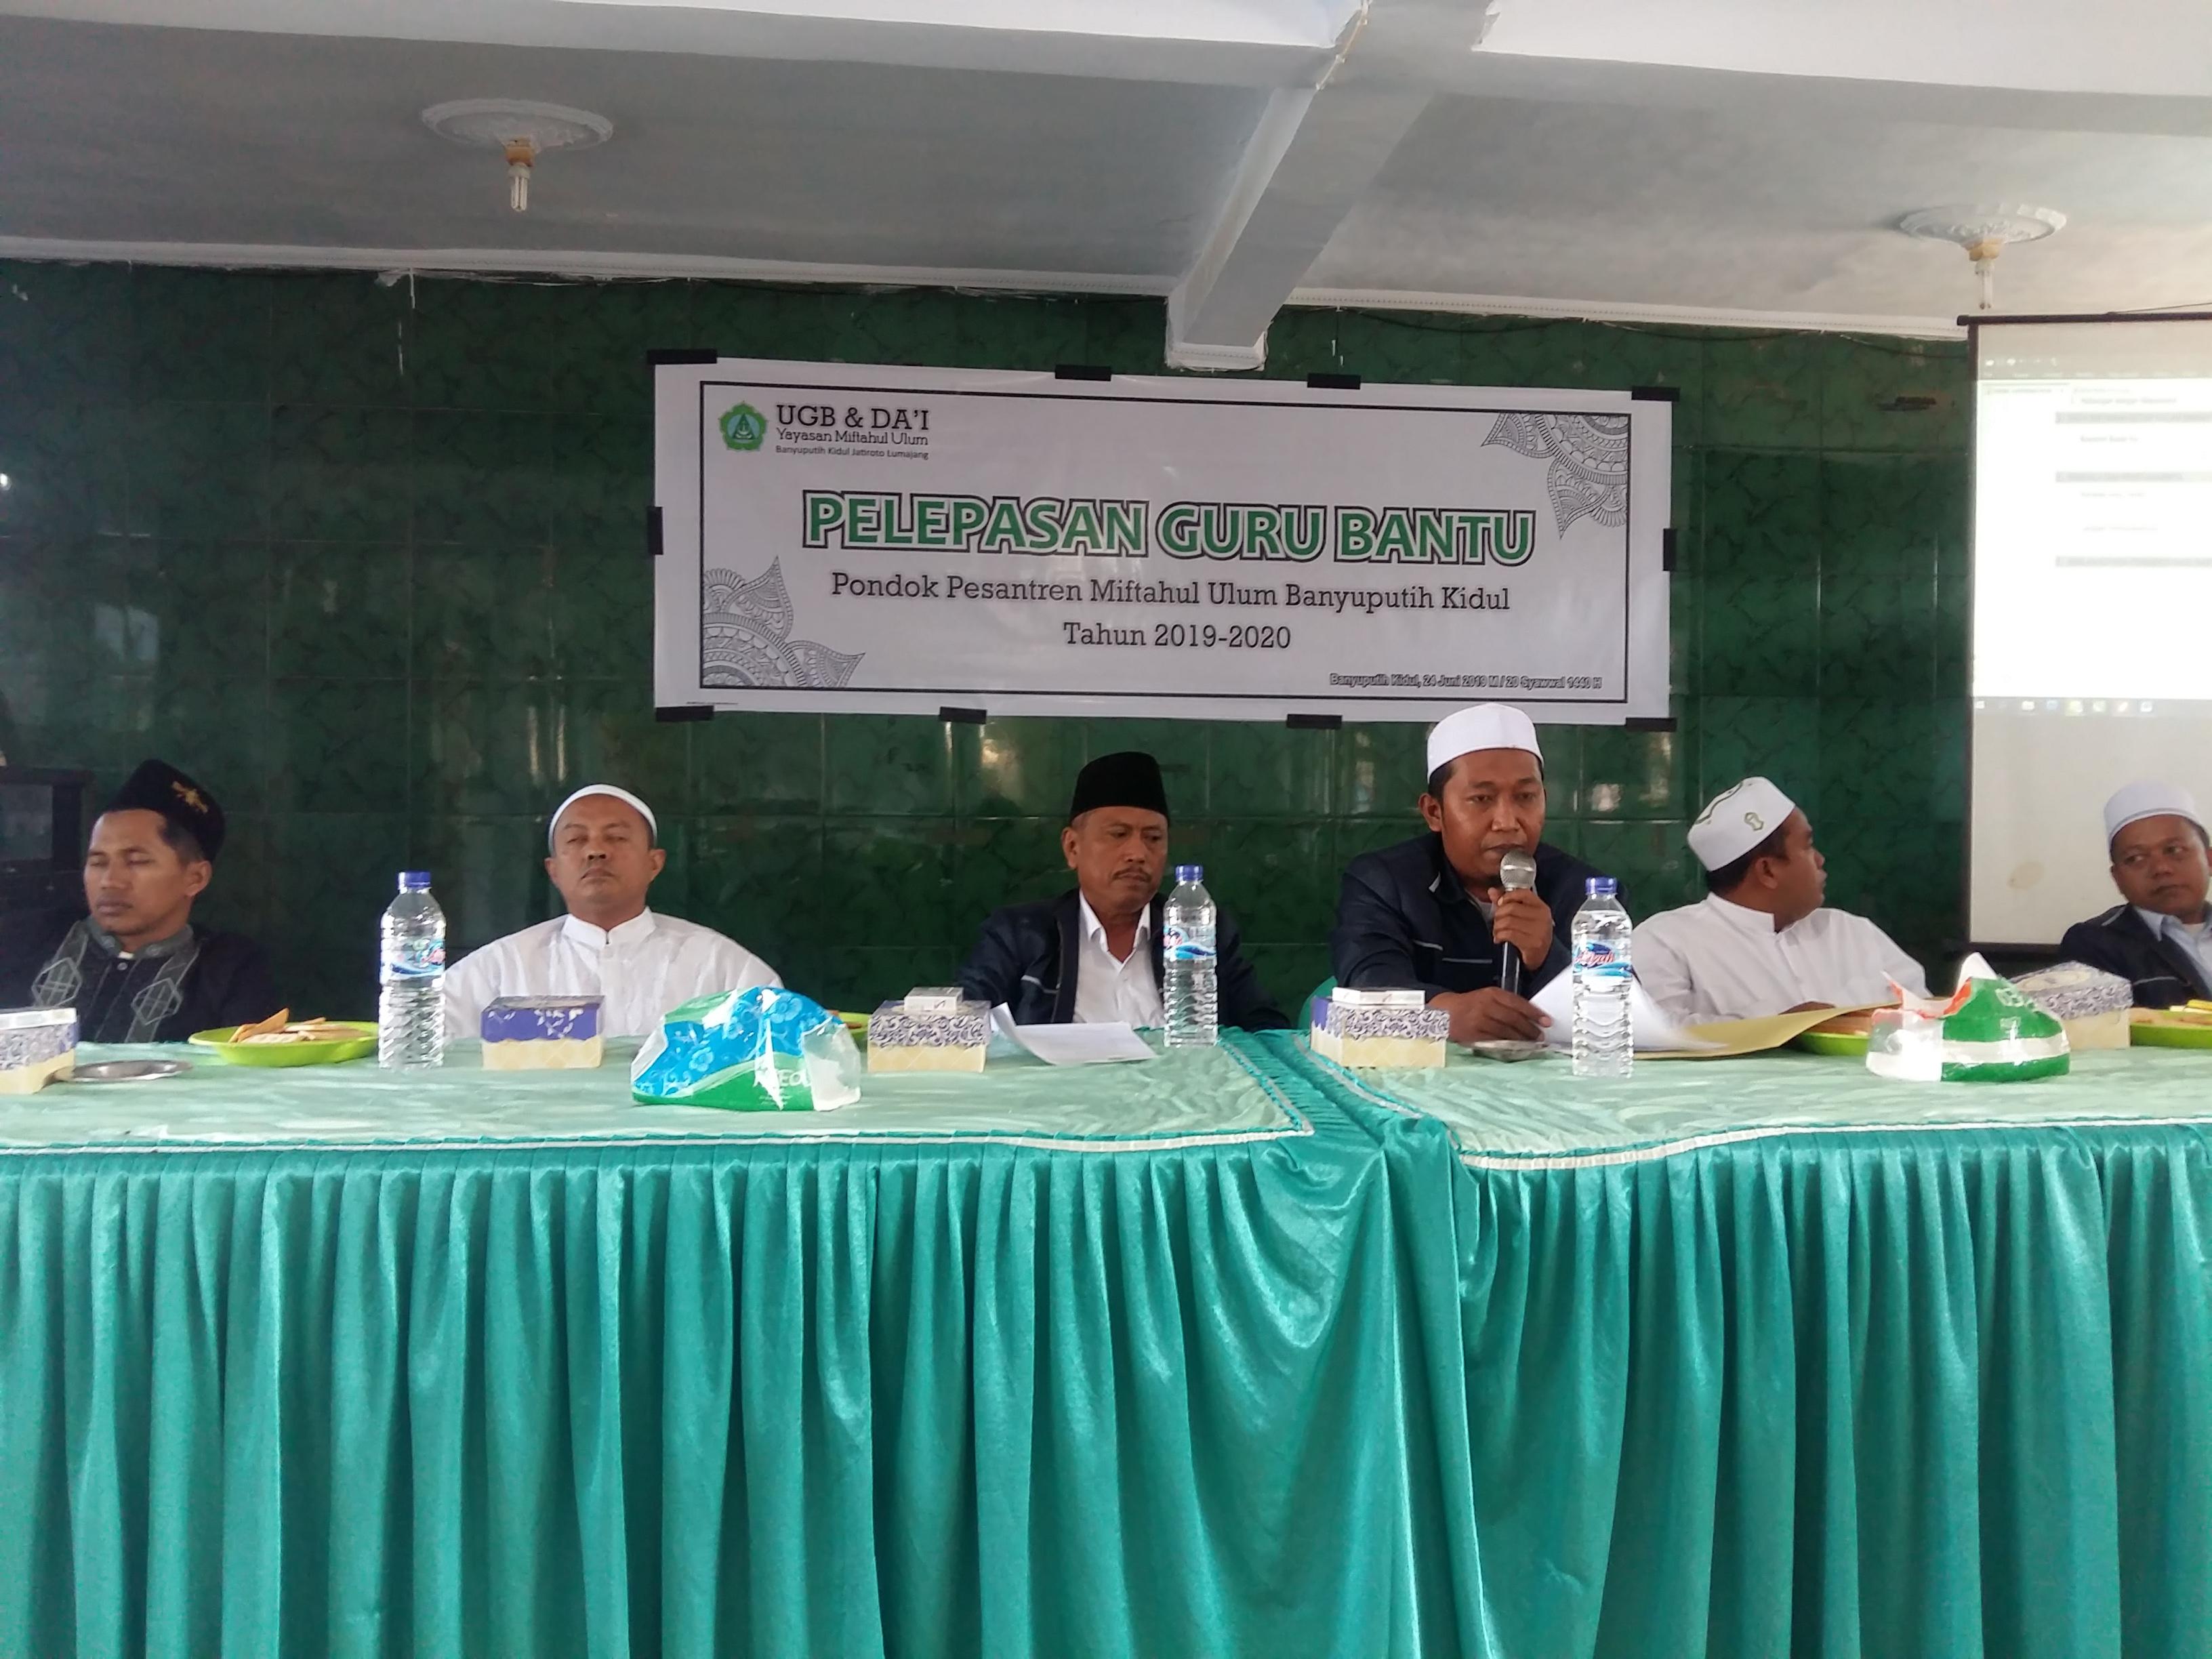 PP. Miftahul Ulum Bakid Berangkatkan 78 Guru Bantu  ke beberapa Pesantren dan Madrasah di Pulau Jawa, Kalimantan dan Batam